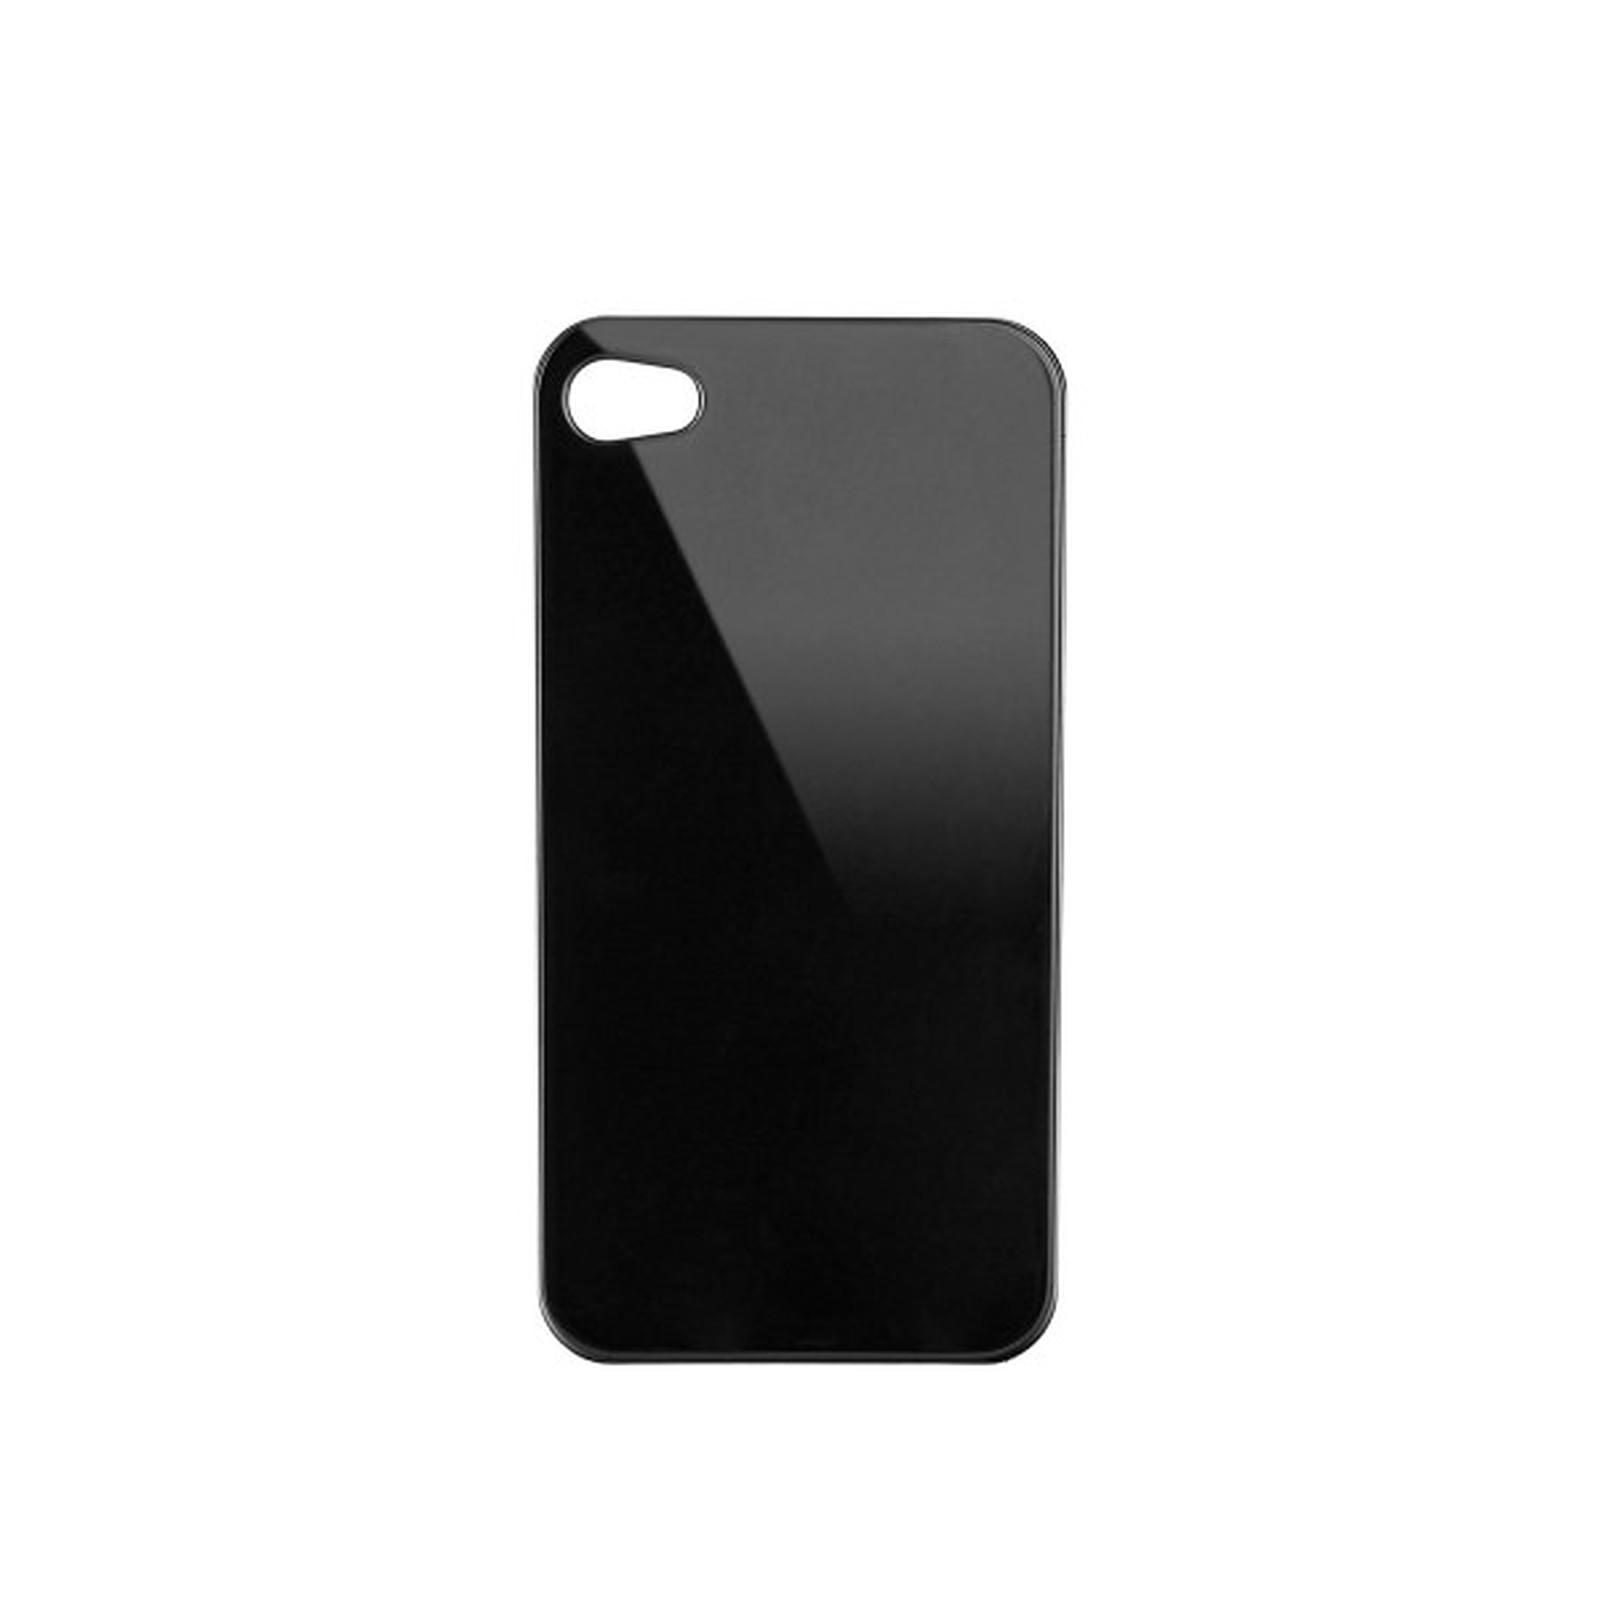 xqisit Coque iPlate iPhone 4/4S Glossy Black